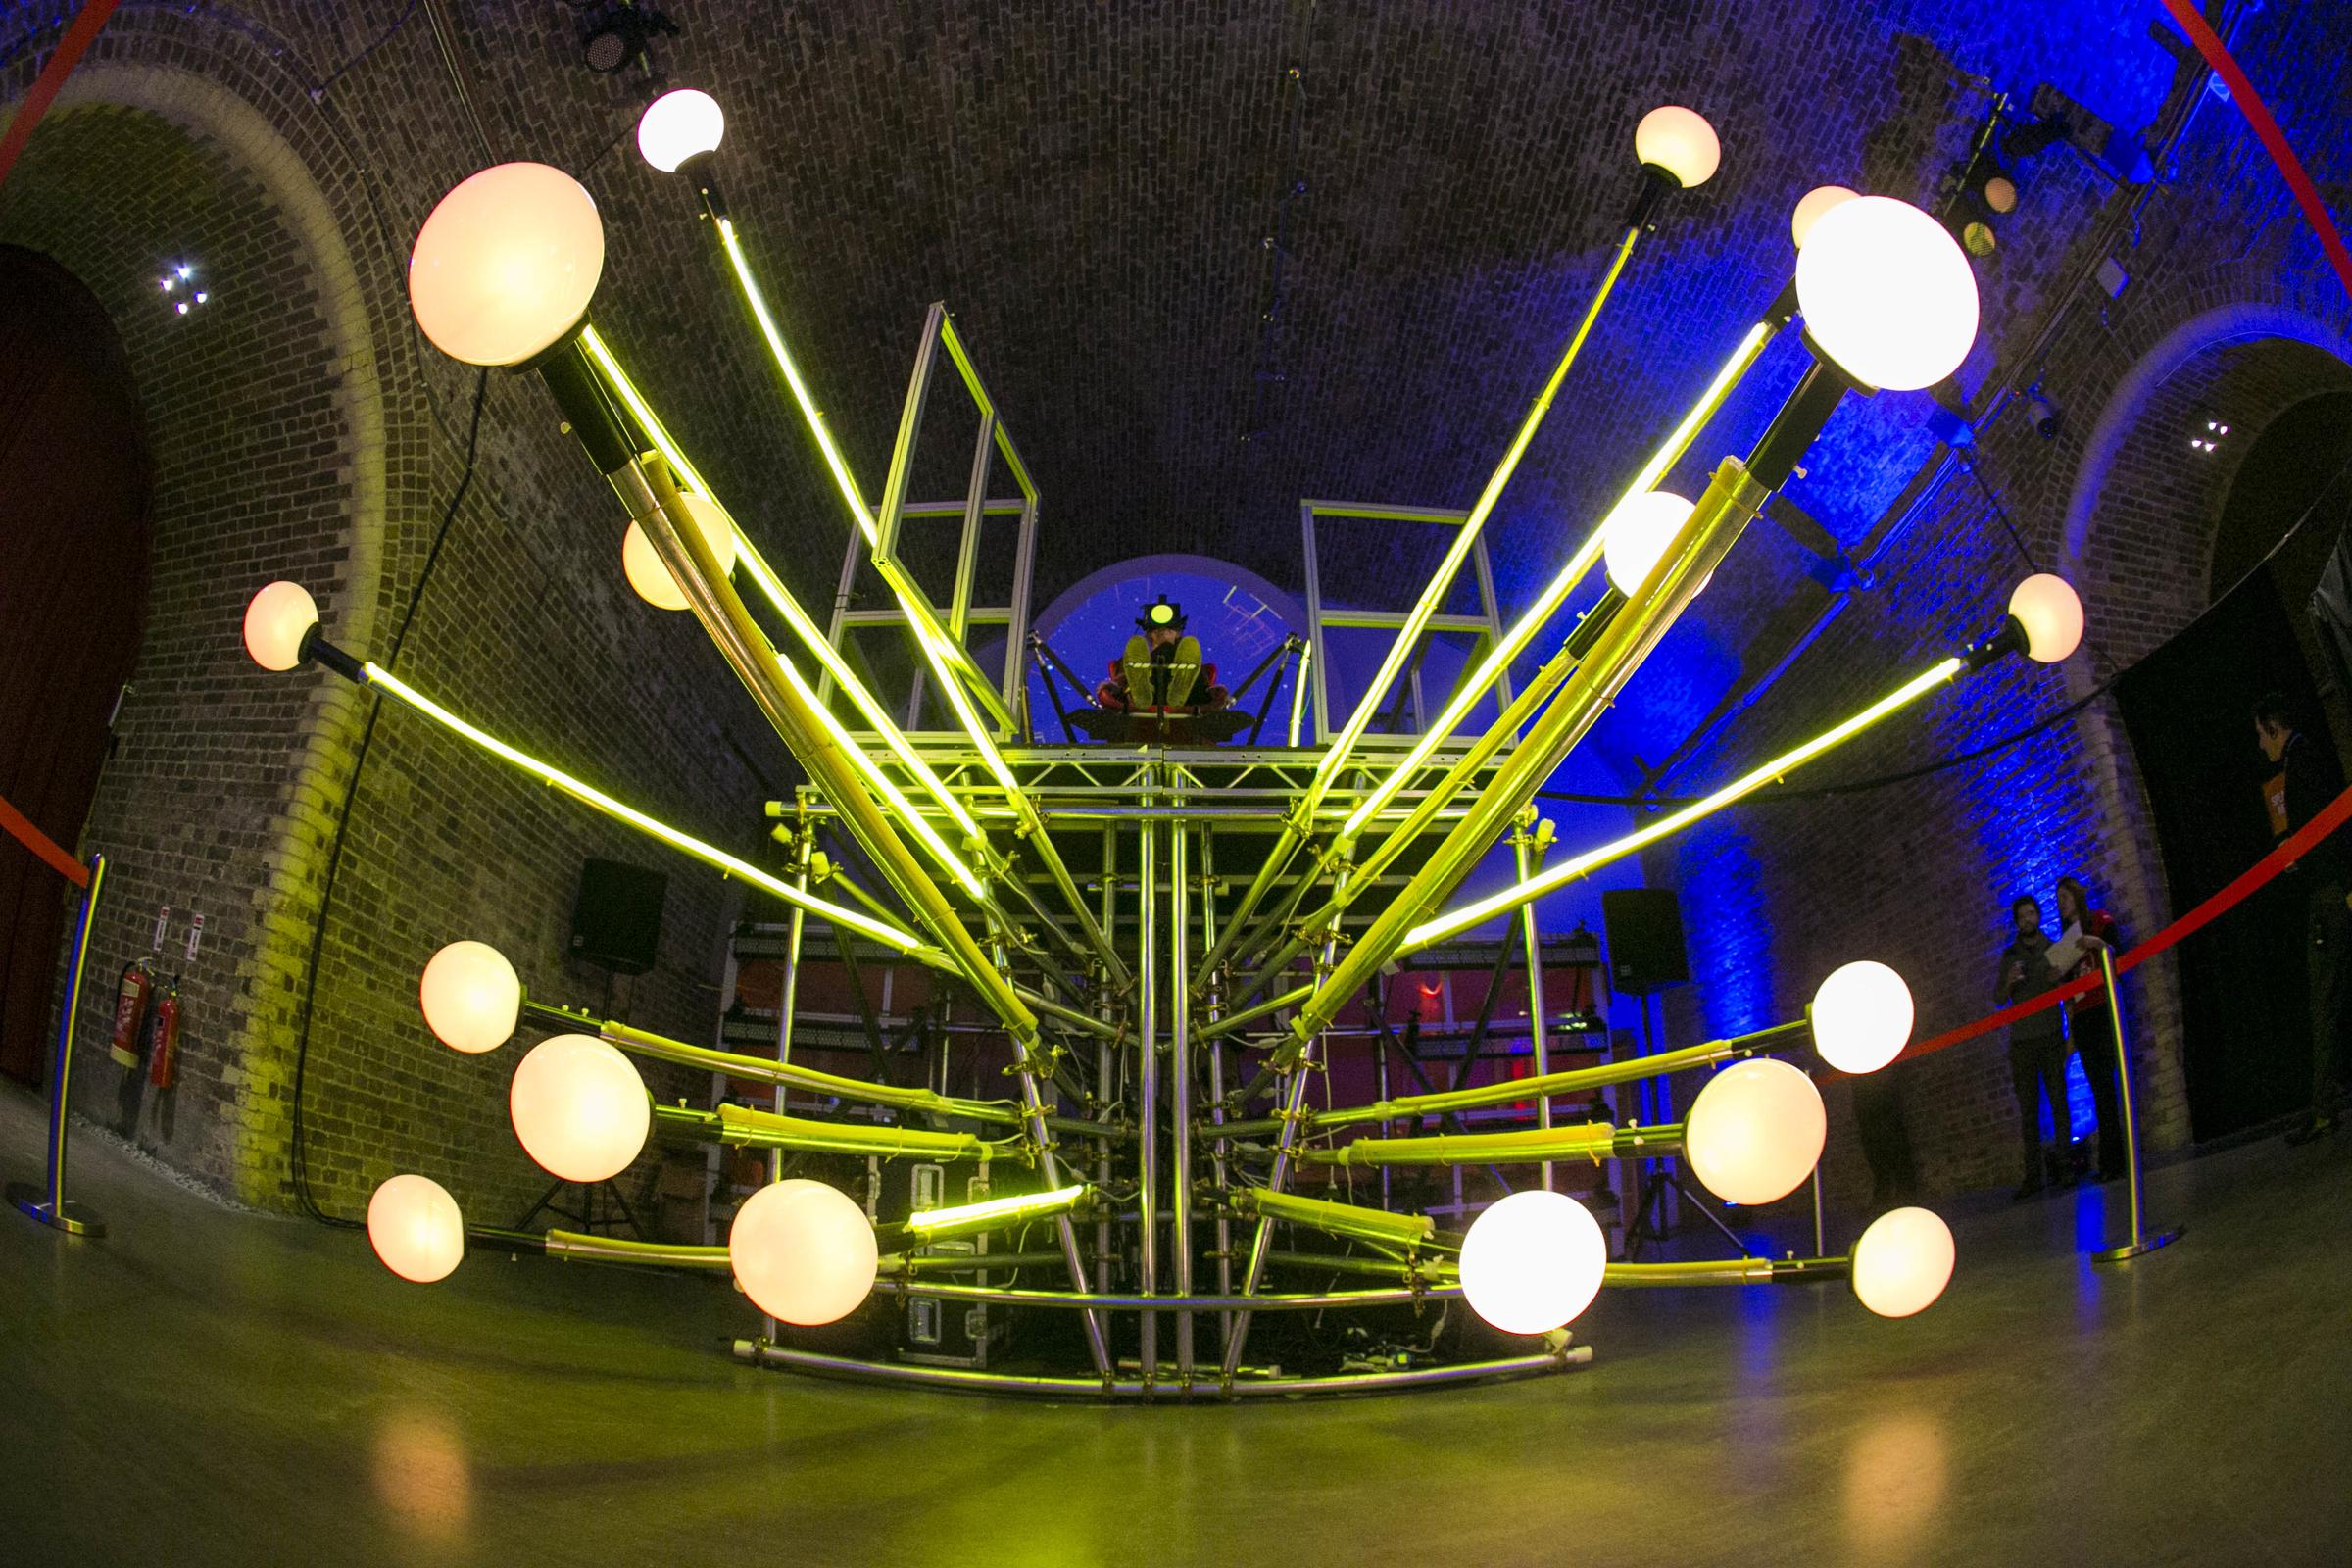 Win VIP passes to FutureFest plus one night at Mondrian London